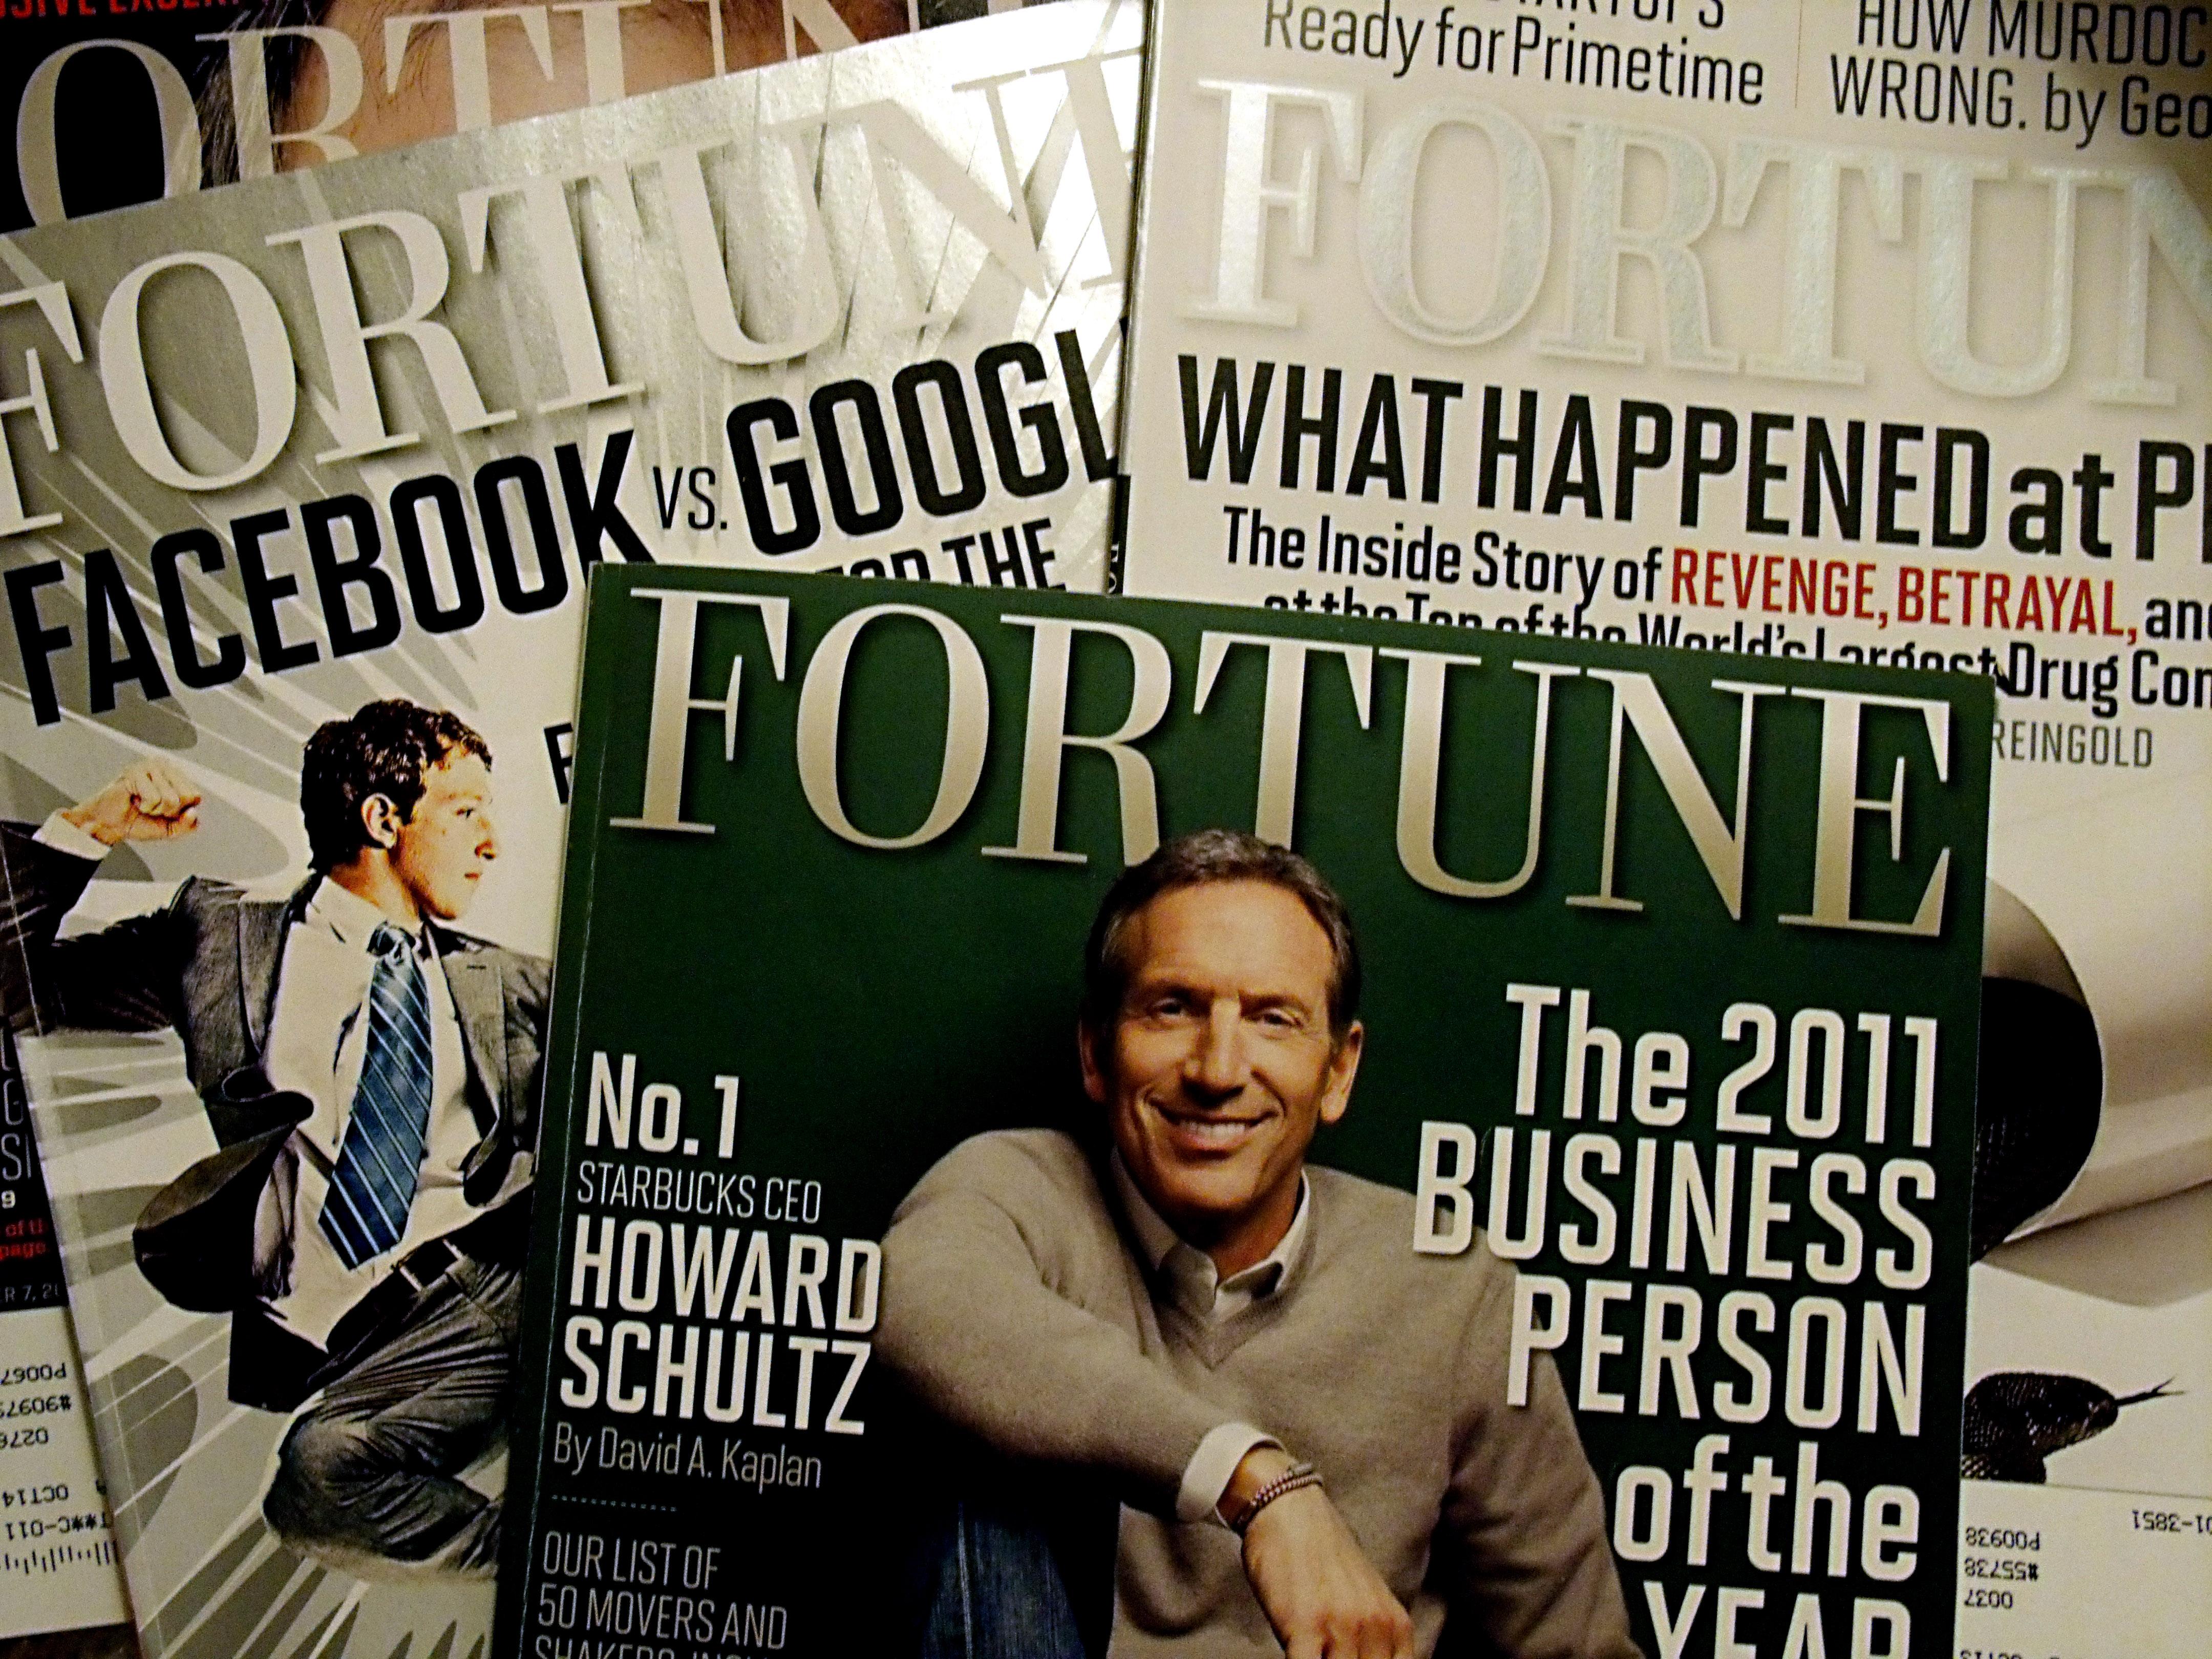 'Fortune' magazineVarious magazines